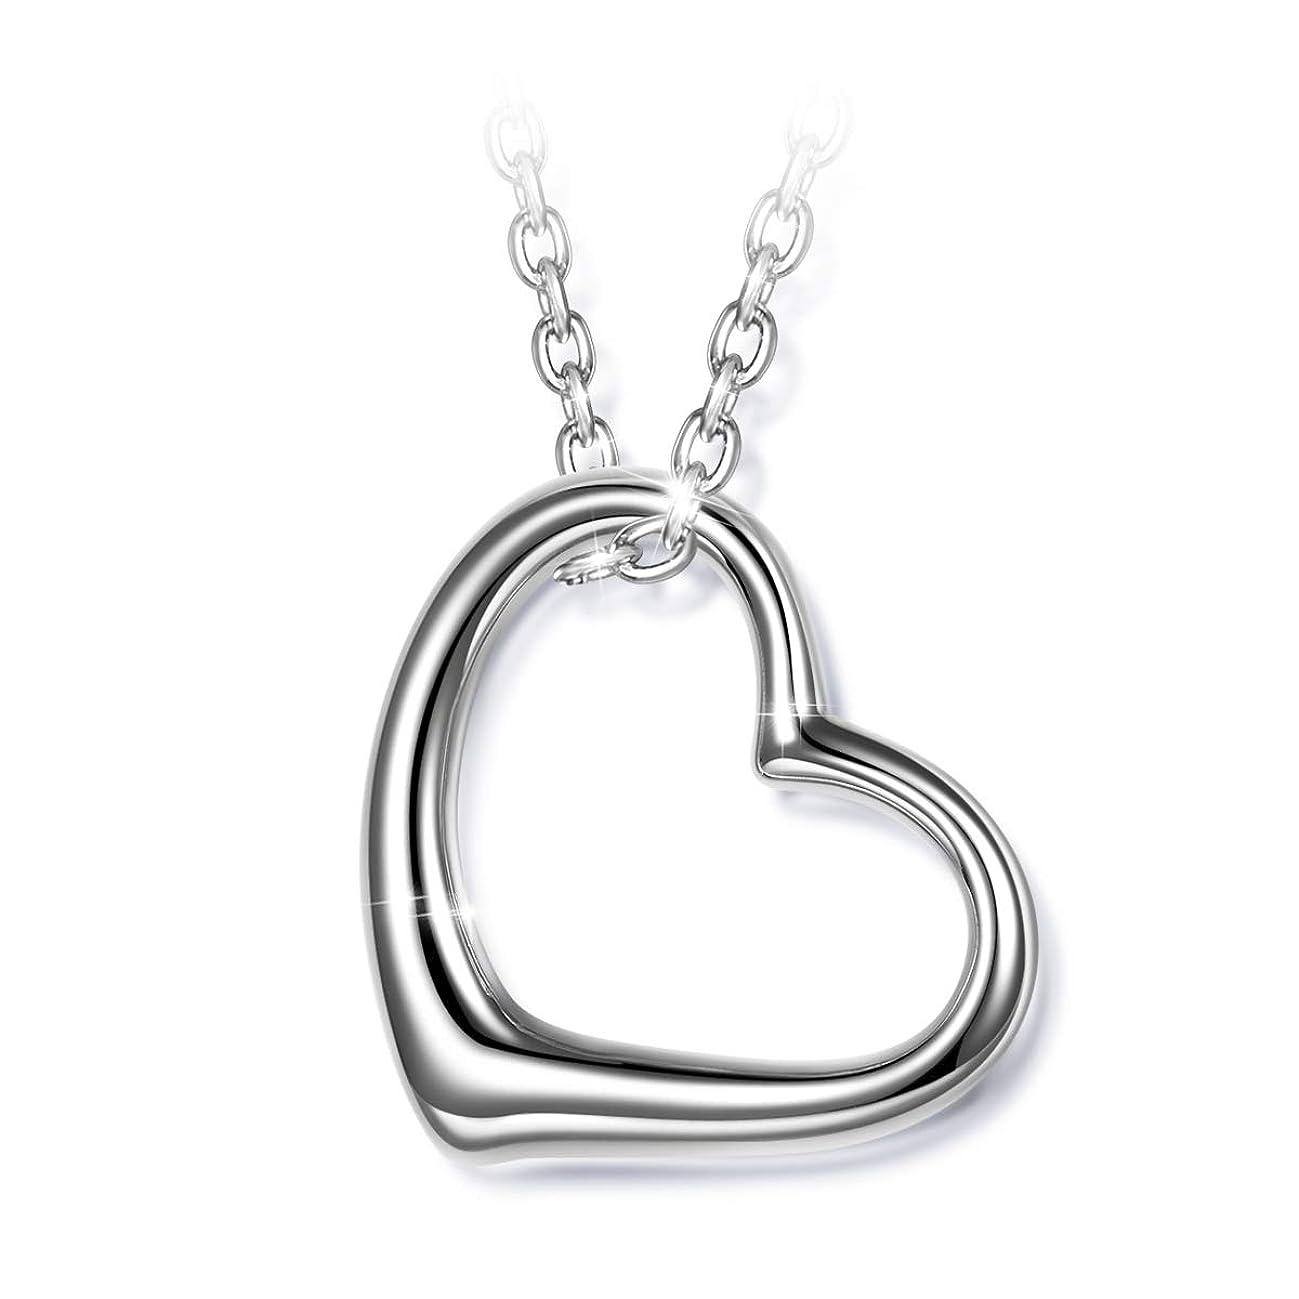 J.NINA Women Heart Neckalce 925 Sterling Silver Women Jewelry Anniversary Birthday Gifts Present for Her Girls Wife